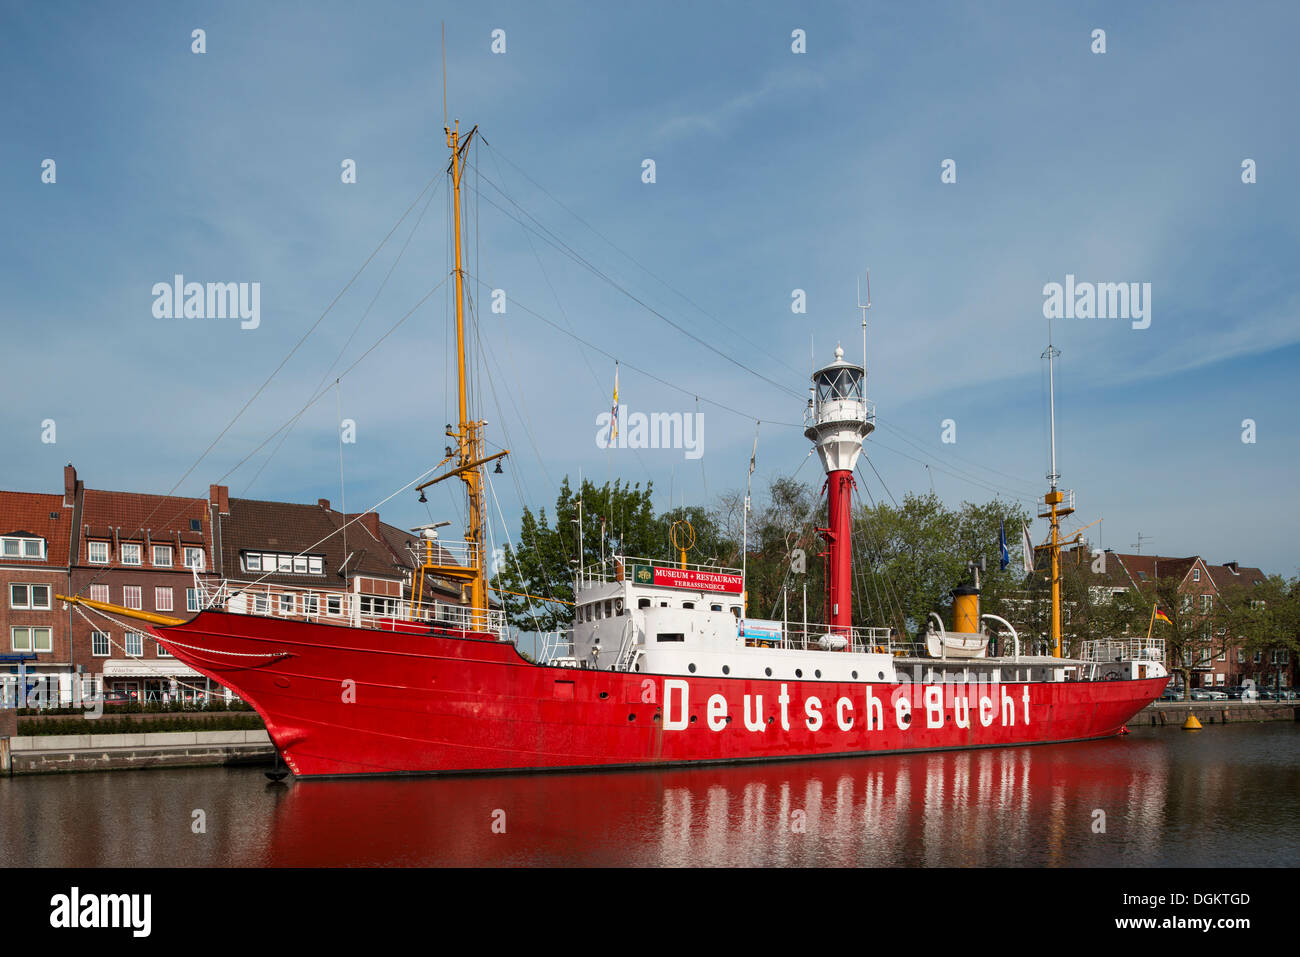 Museum Ship 'Deutsche Bucht', Emden, Ratsdelft, East Frisia, Lower Saxony - Stock Image